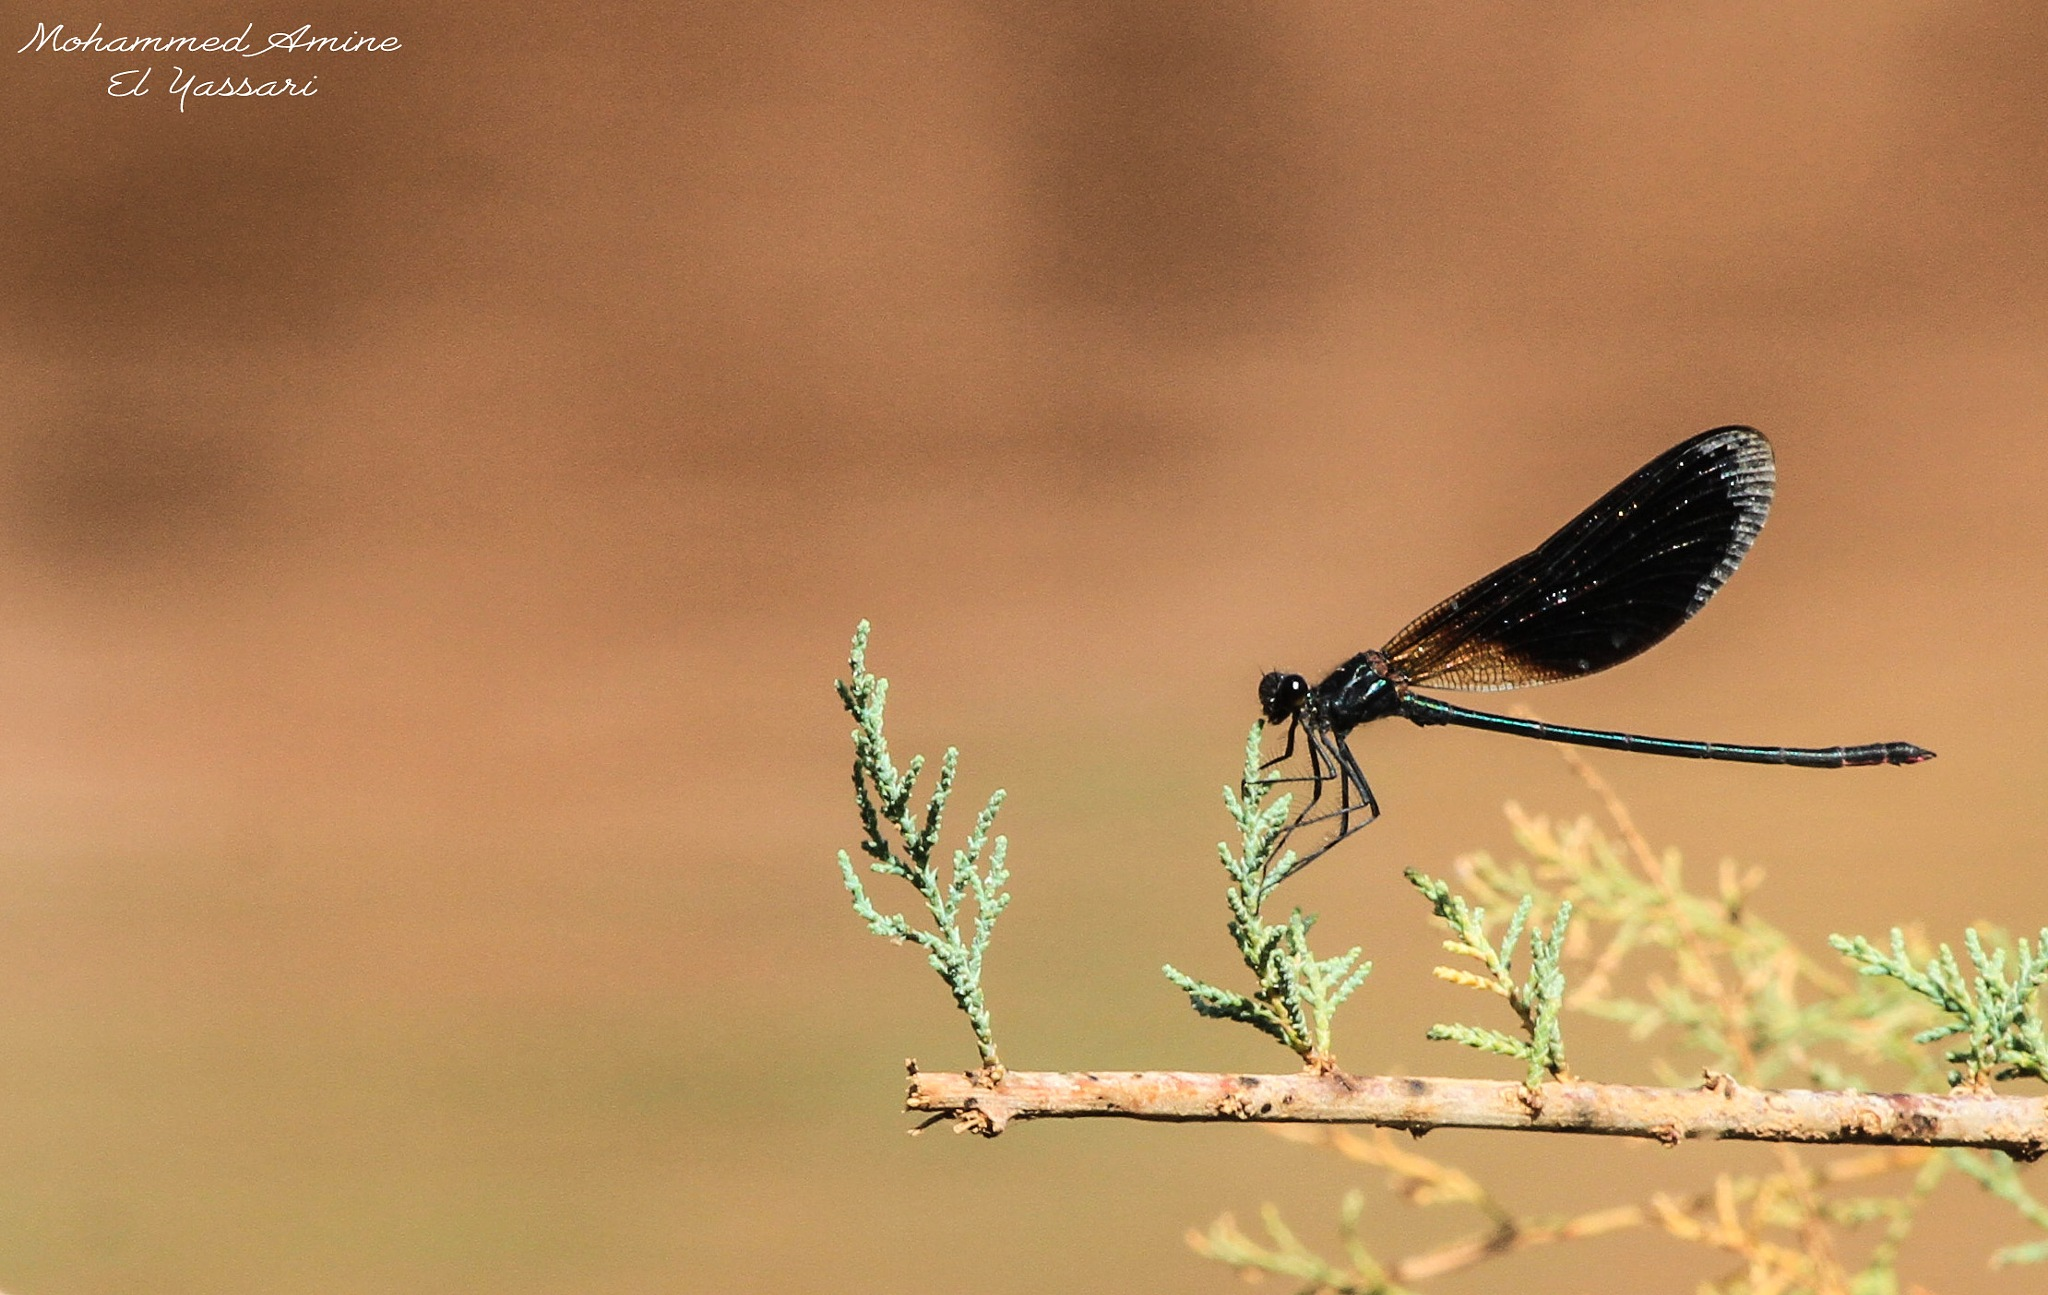 pterygota by elyassari